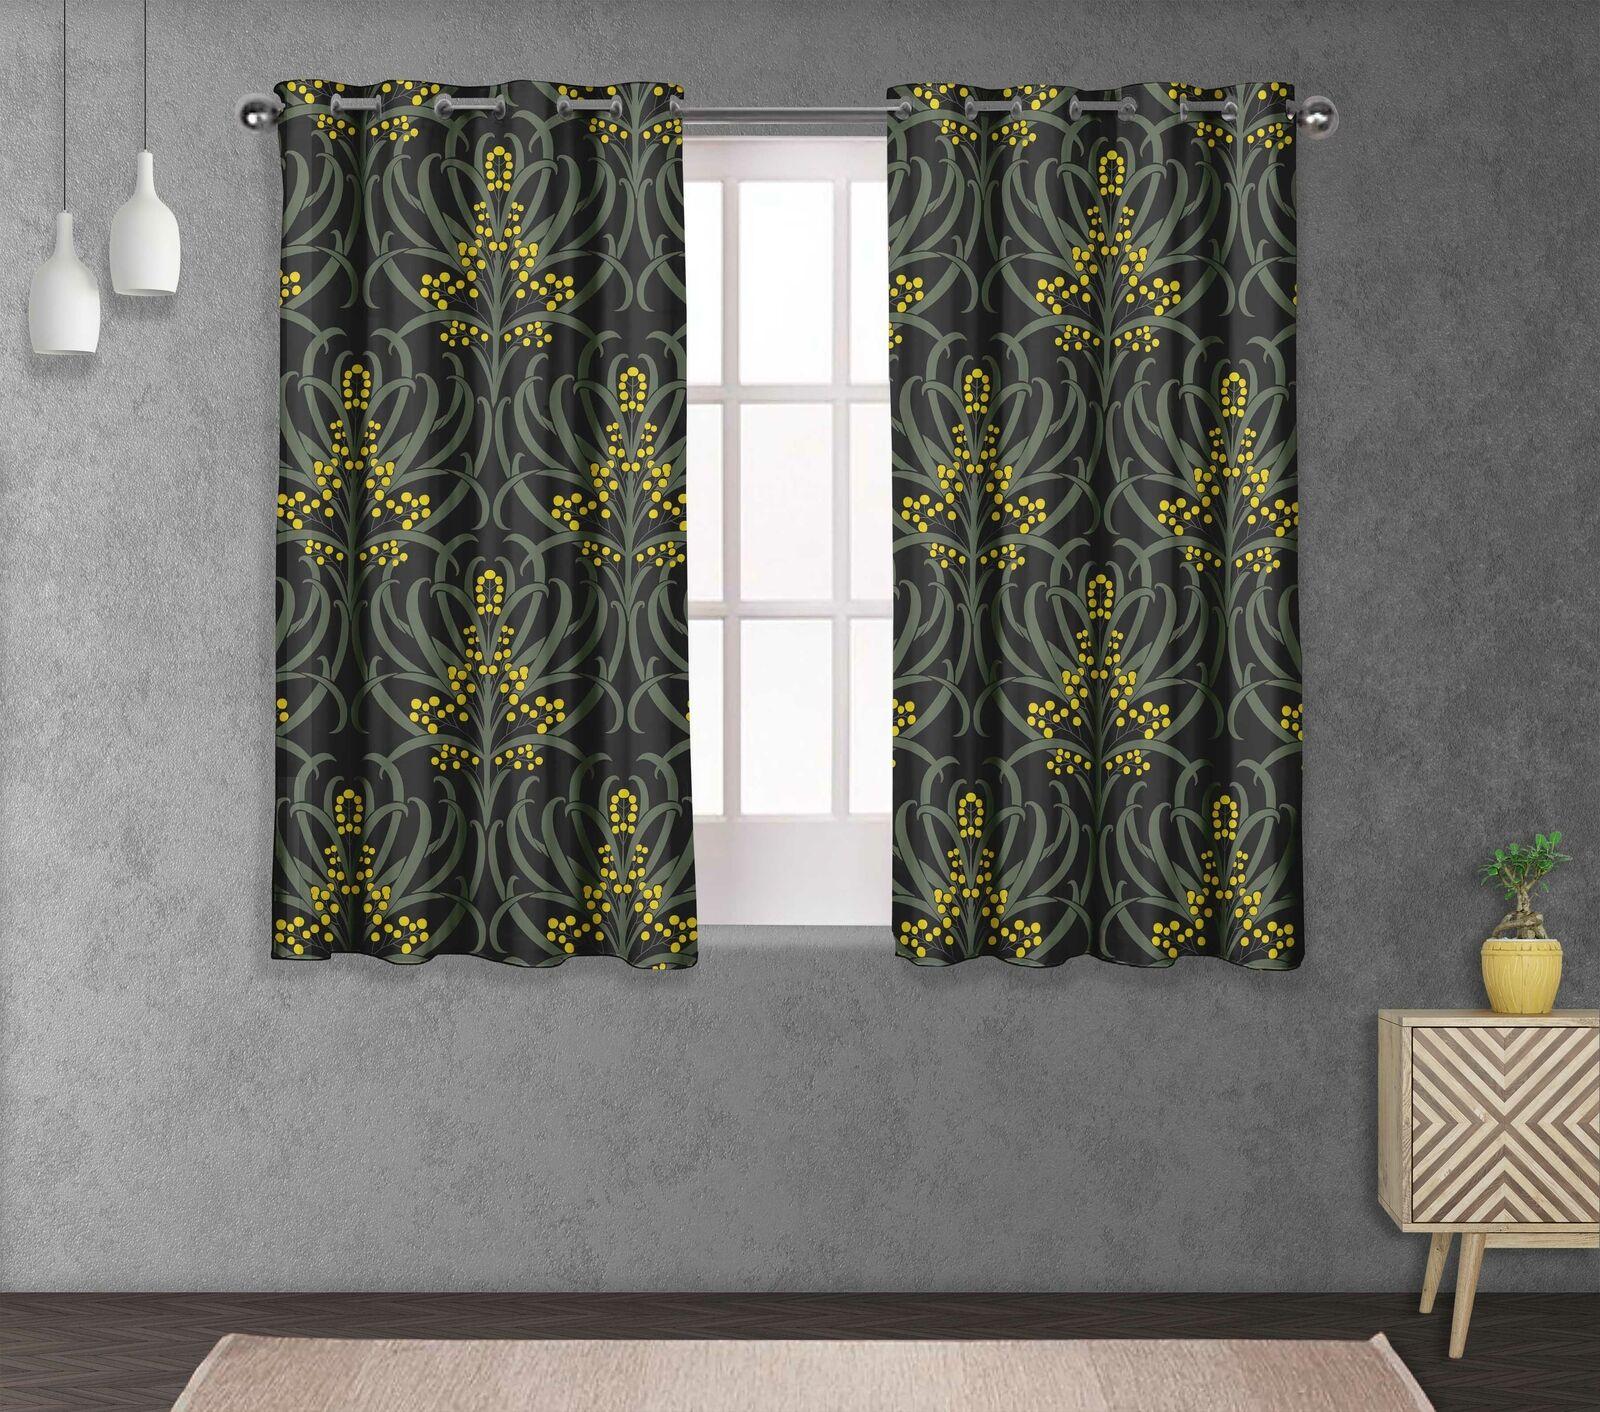 S4sassy rosso Berries & Artistic Living Room Window short & long Curtain-FL-26M